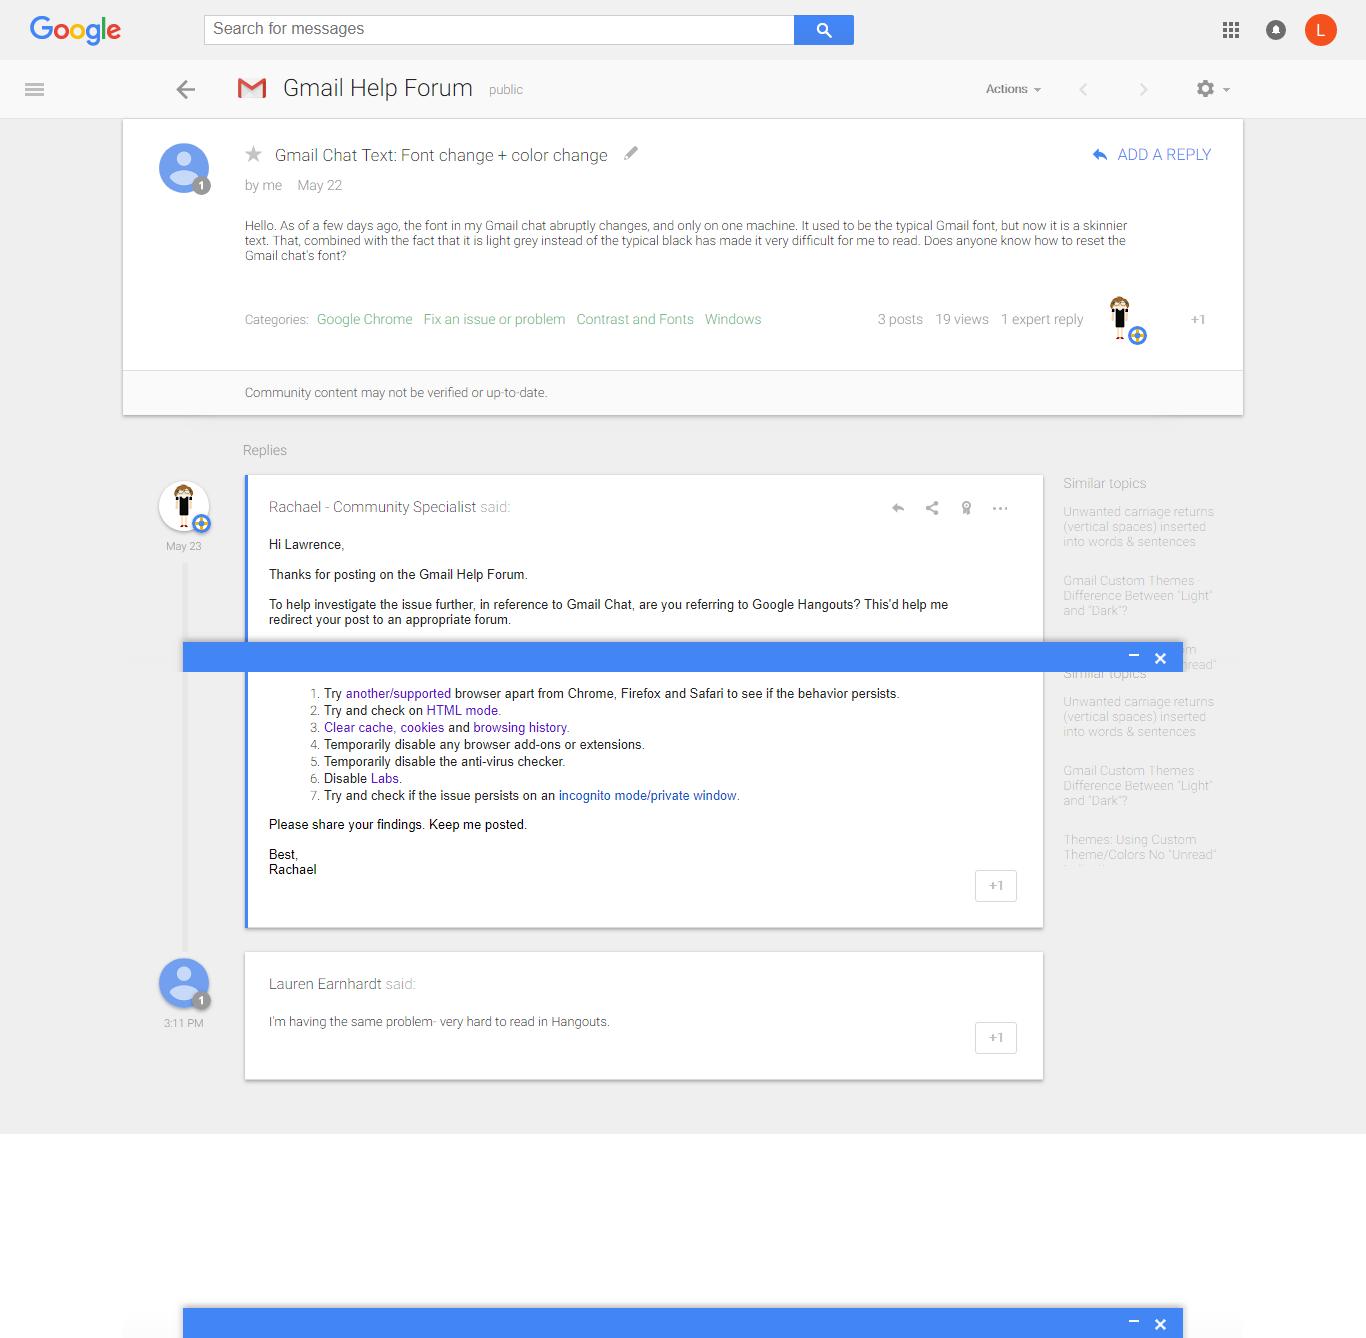 Gmail Chat Text: Font change + color change - Gmail Help